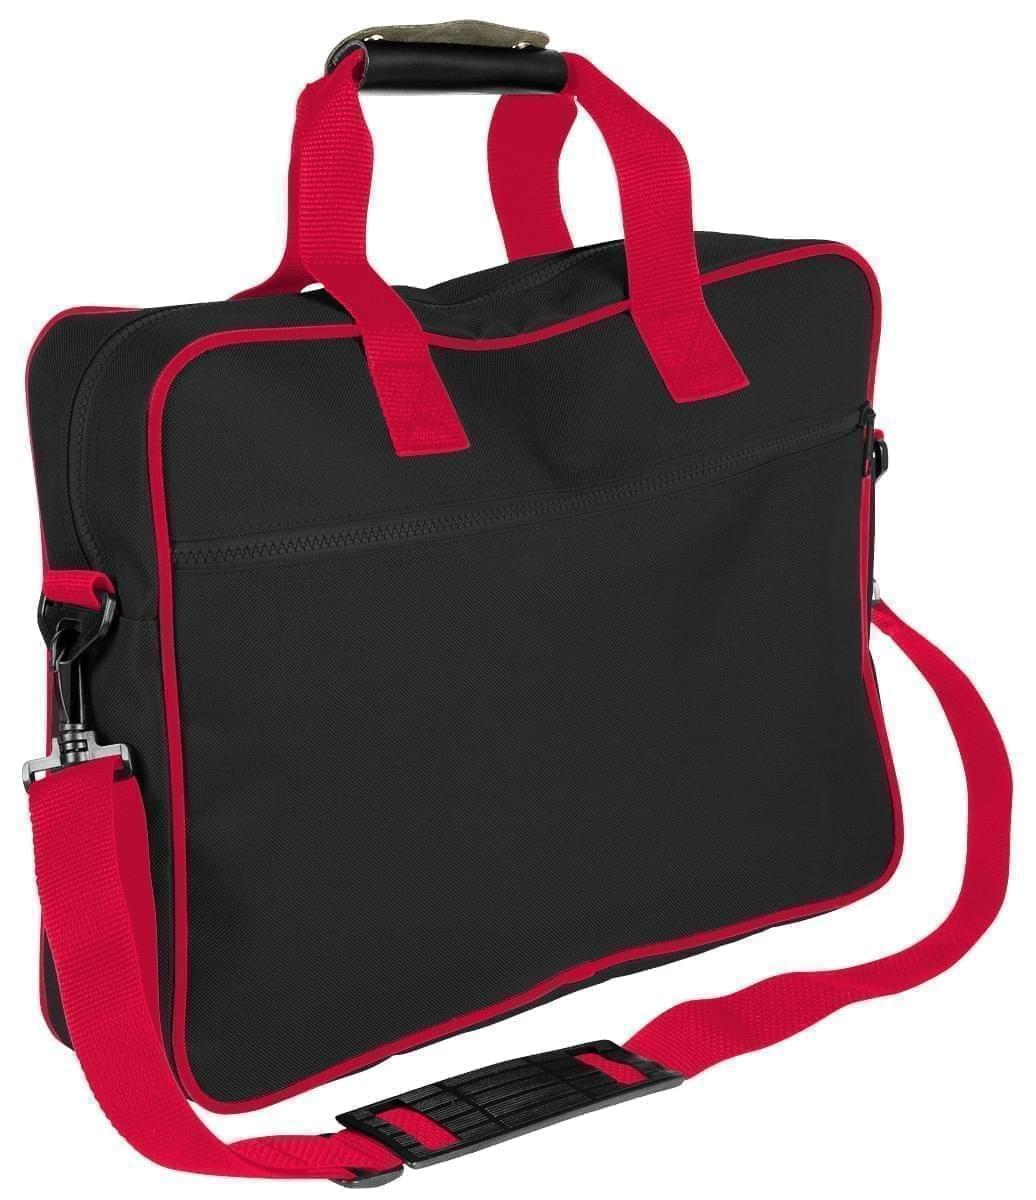 USA Made Nylon Poly Notebook Sleeves, Black-Red, CPKVA59PO2